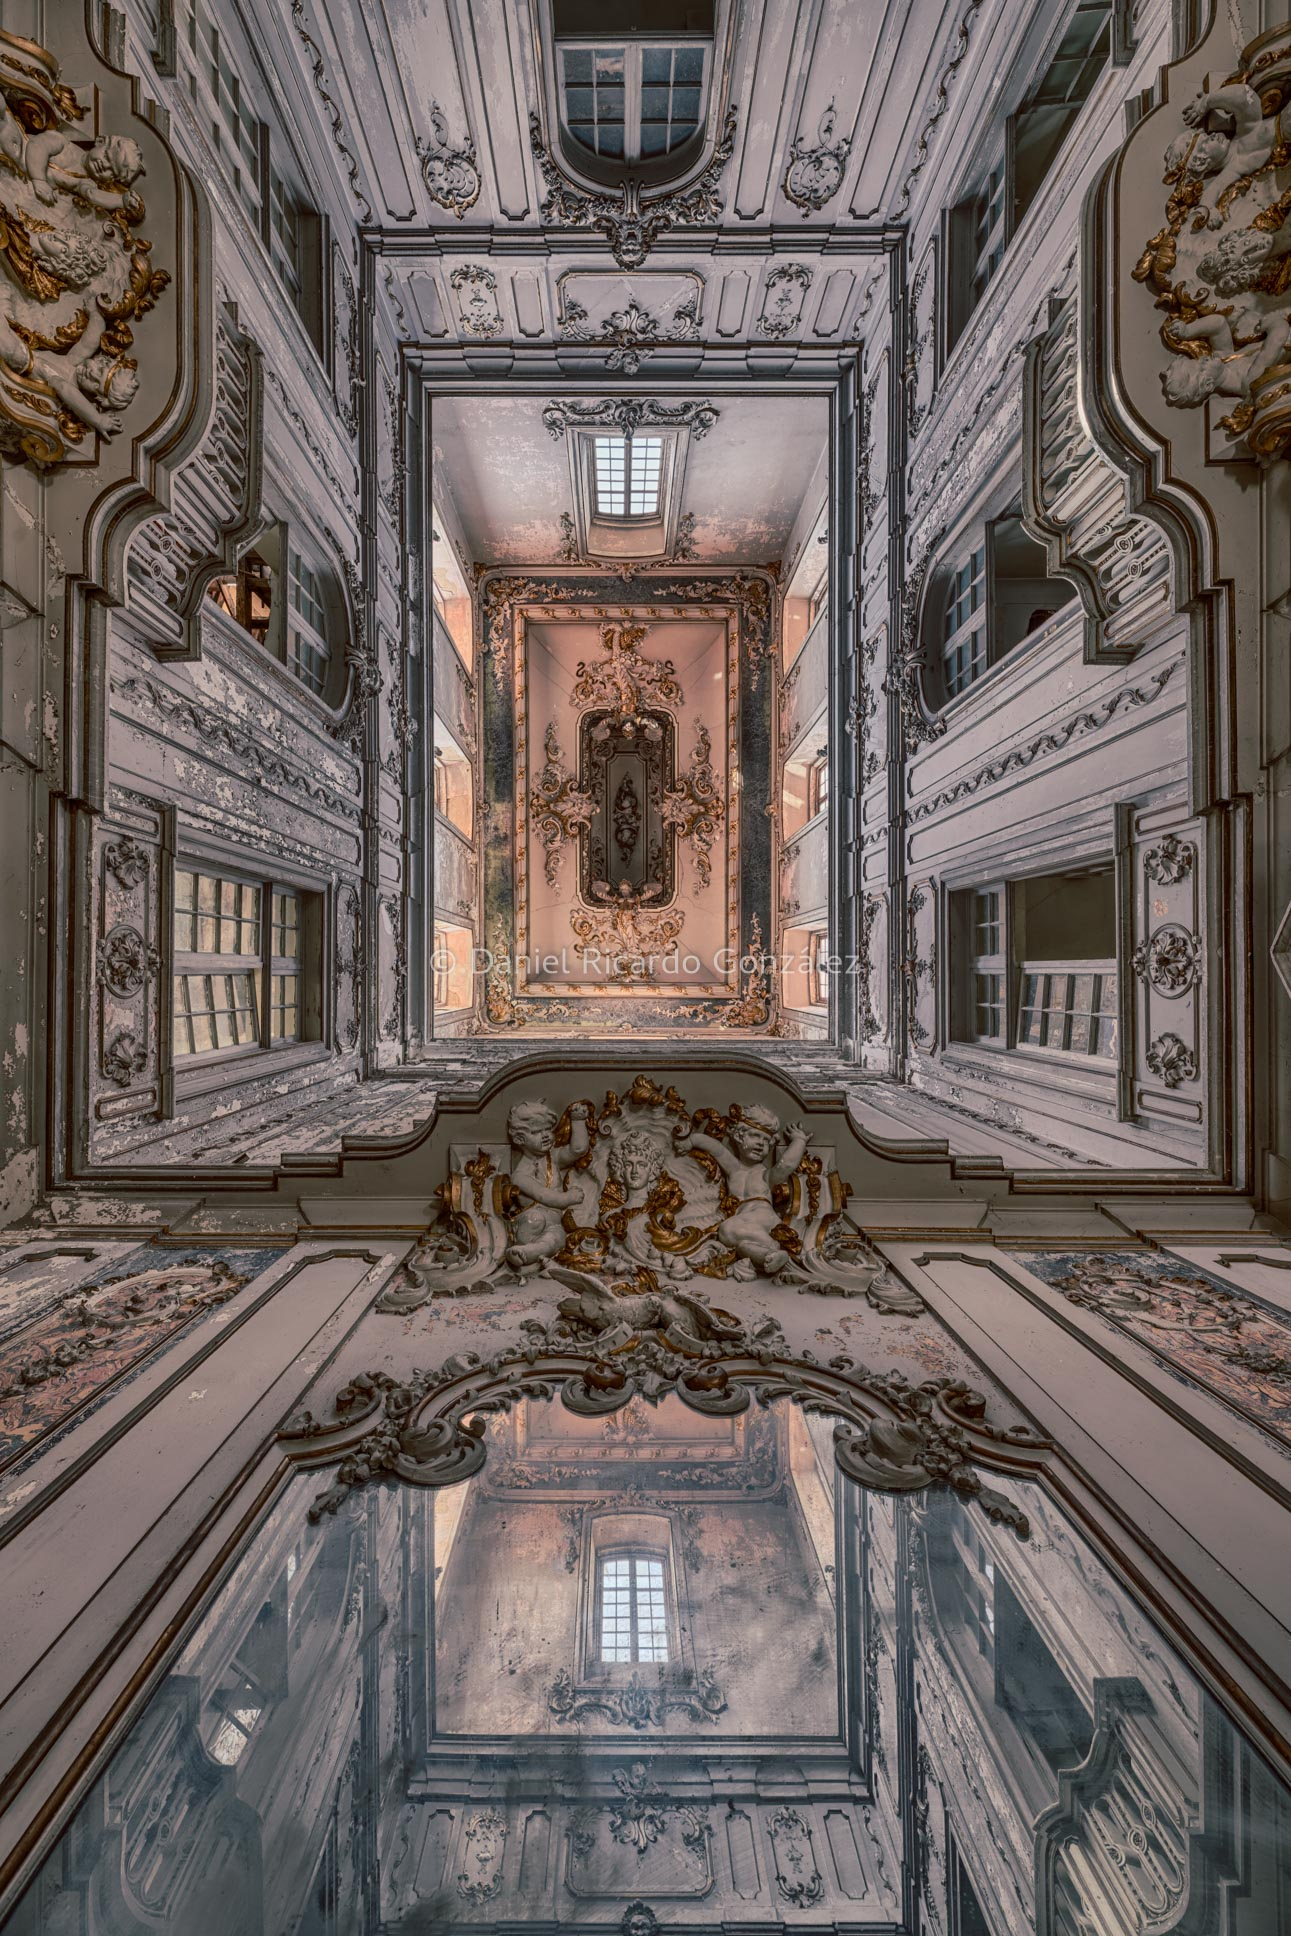 Barocker Lichtinnenhof eines verlassenen Palastes in Portugal. Baroque light courtyard of an abandoned palace in Portugal.